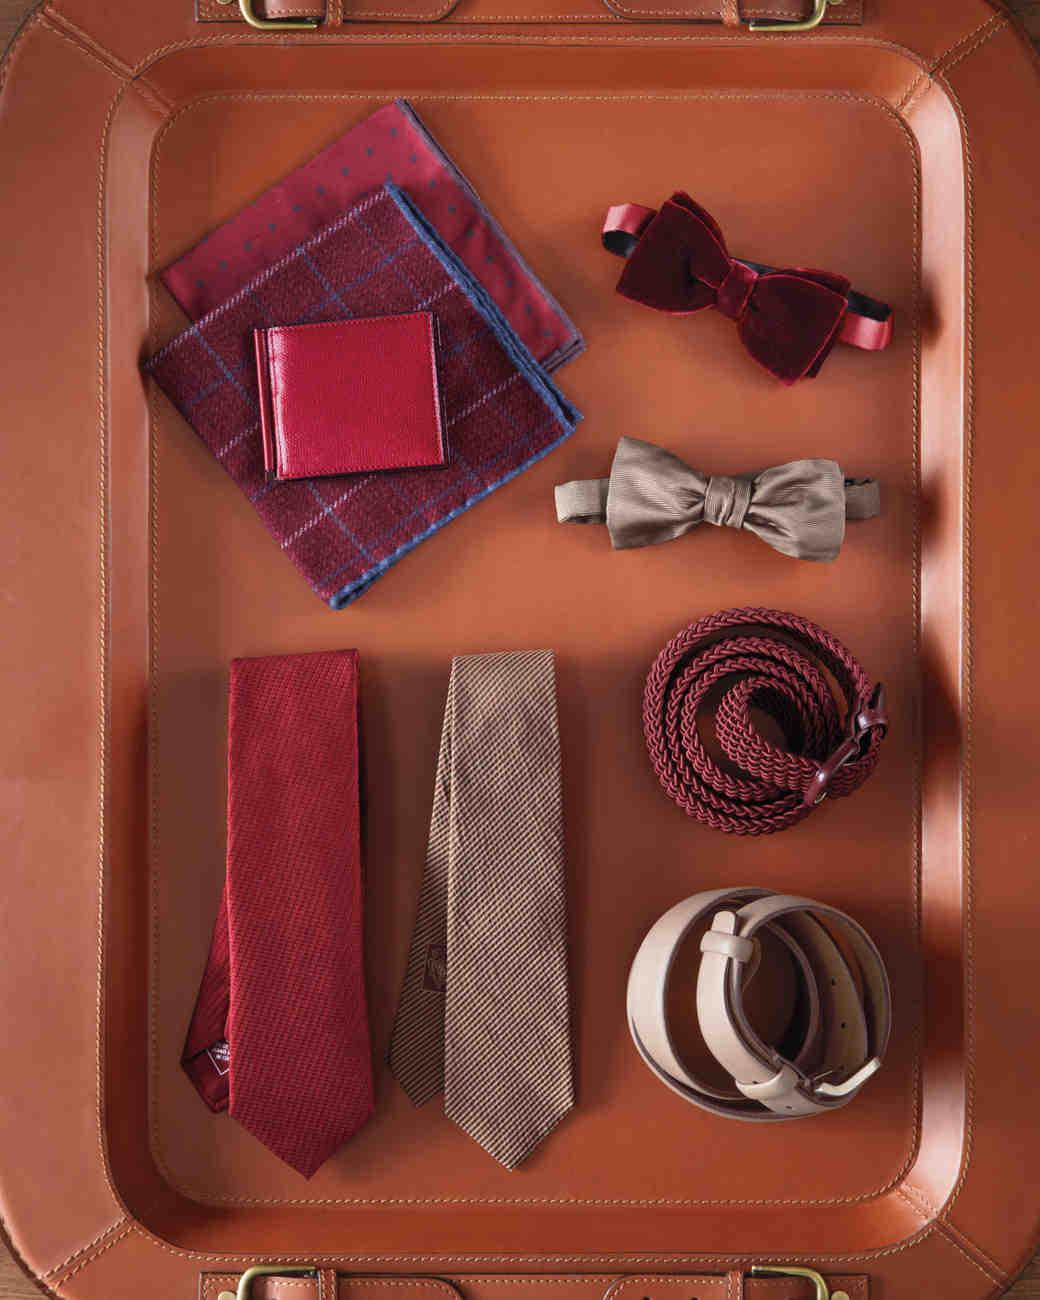 mens-accessories-030-029-025-comp-mwd110159.jpg